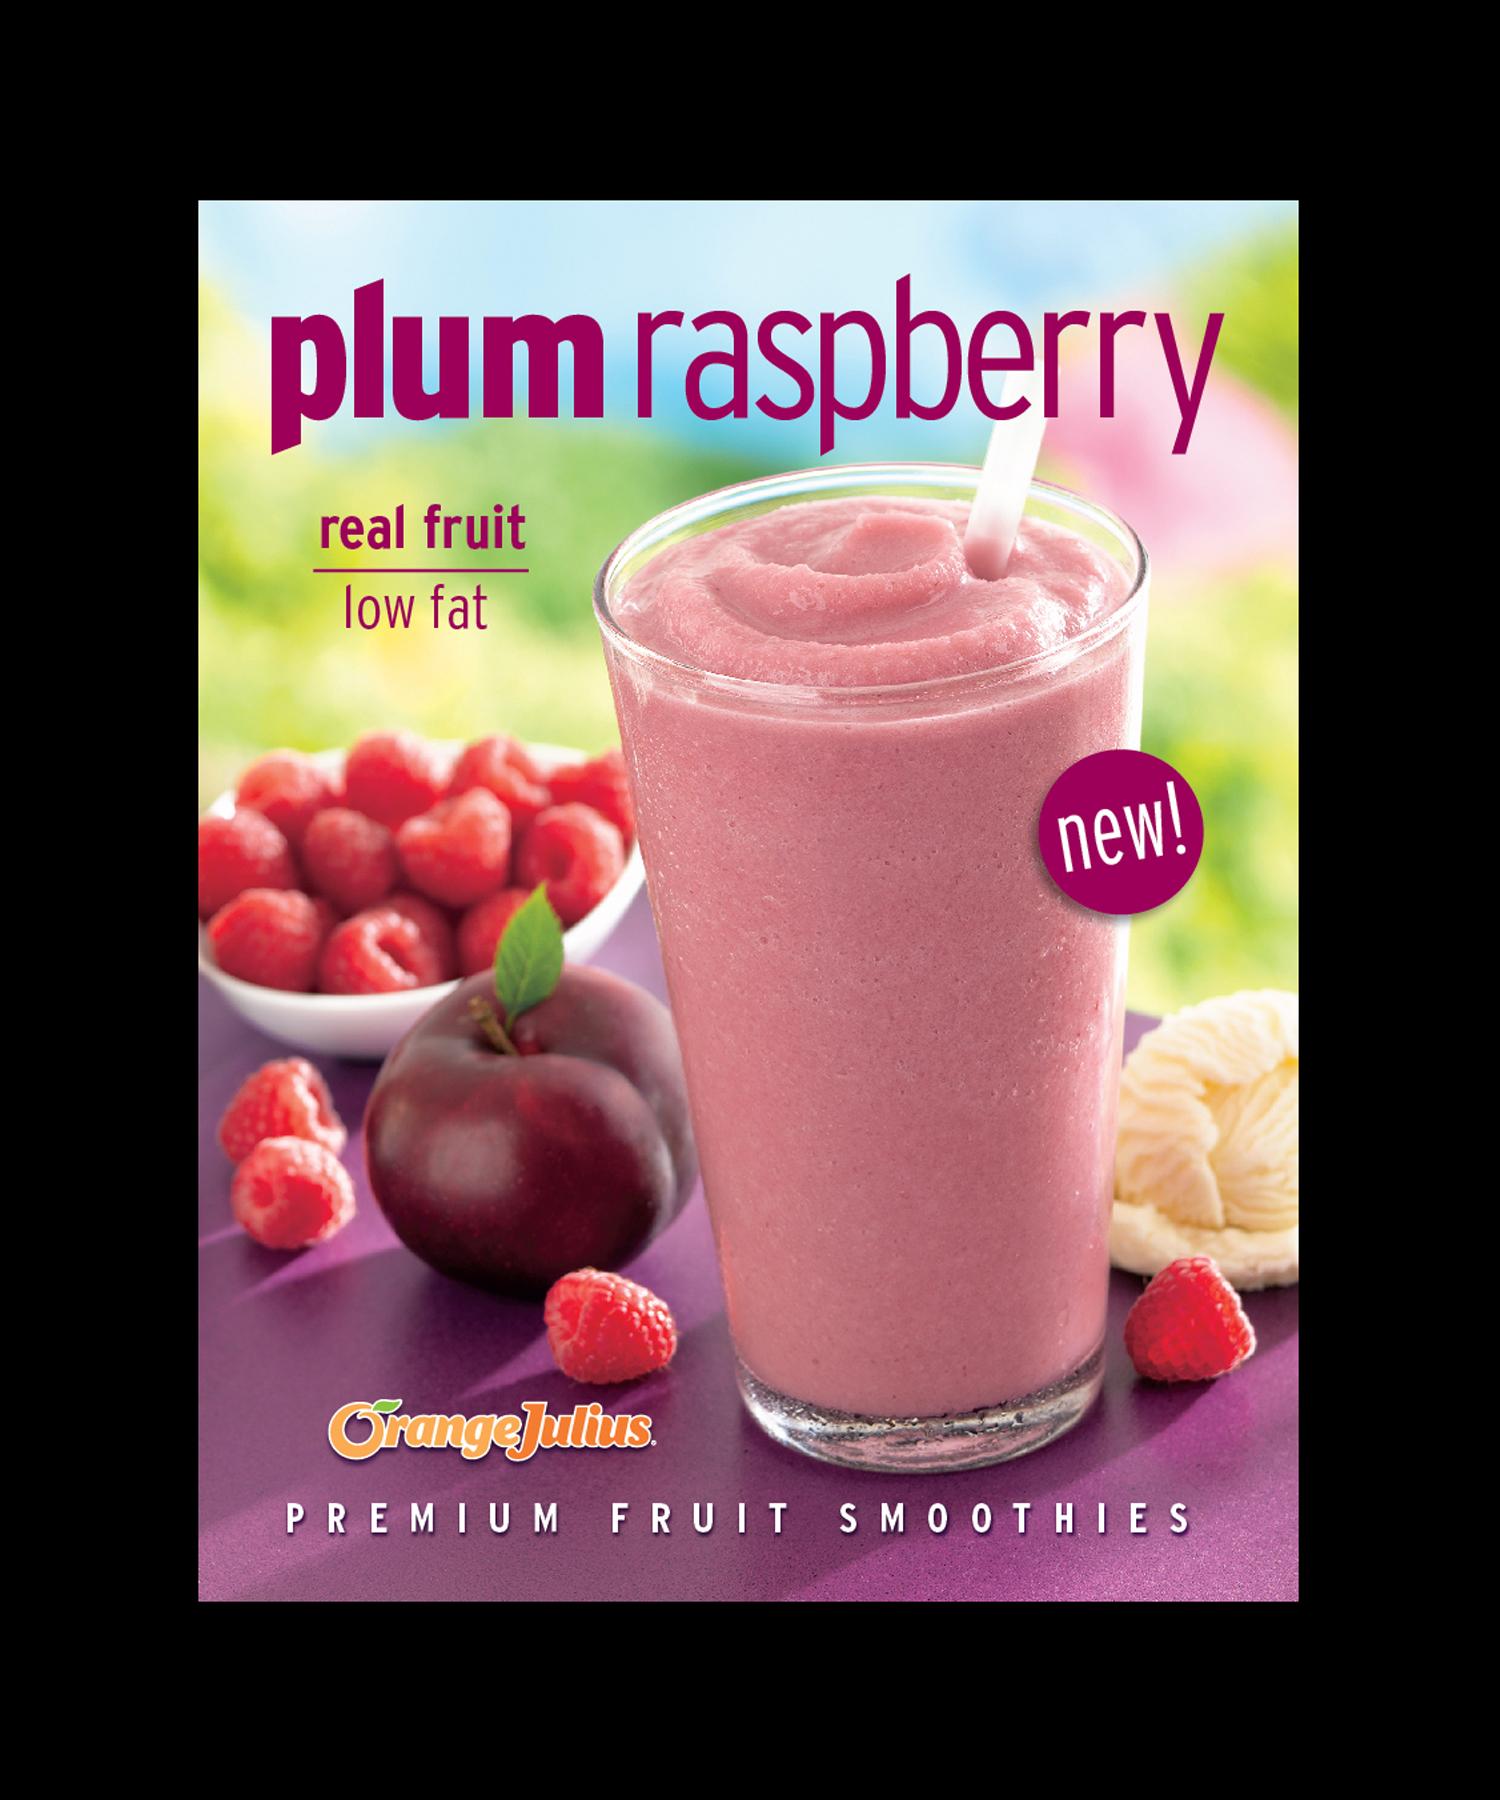 Plum Raspberry.jpg